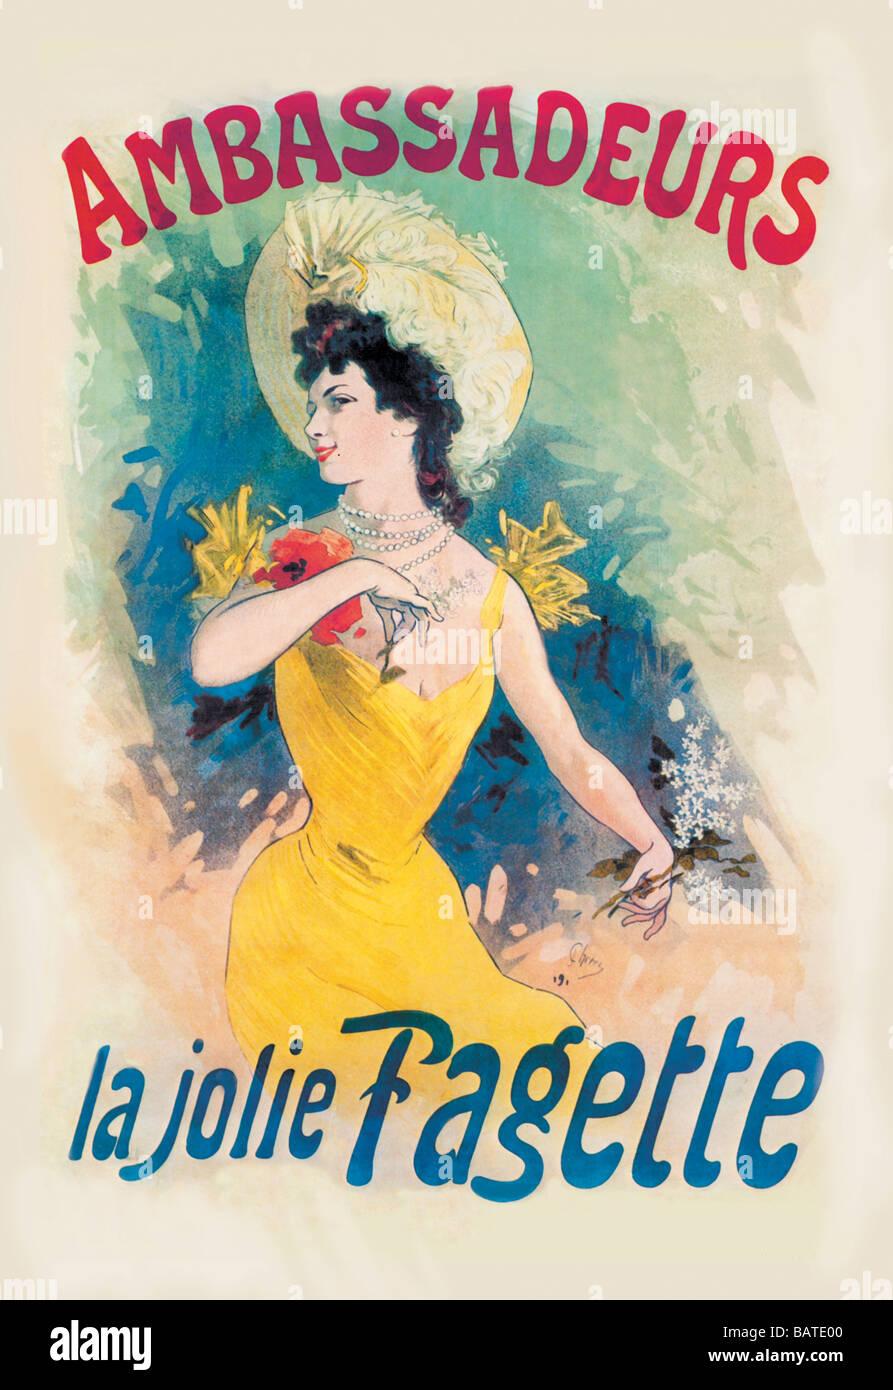 Ambassadeurs: La Jolie Fagette Stockfoto